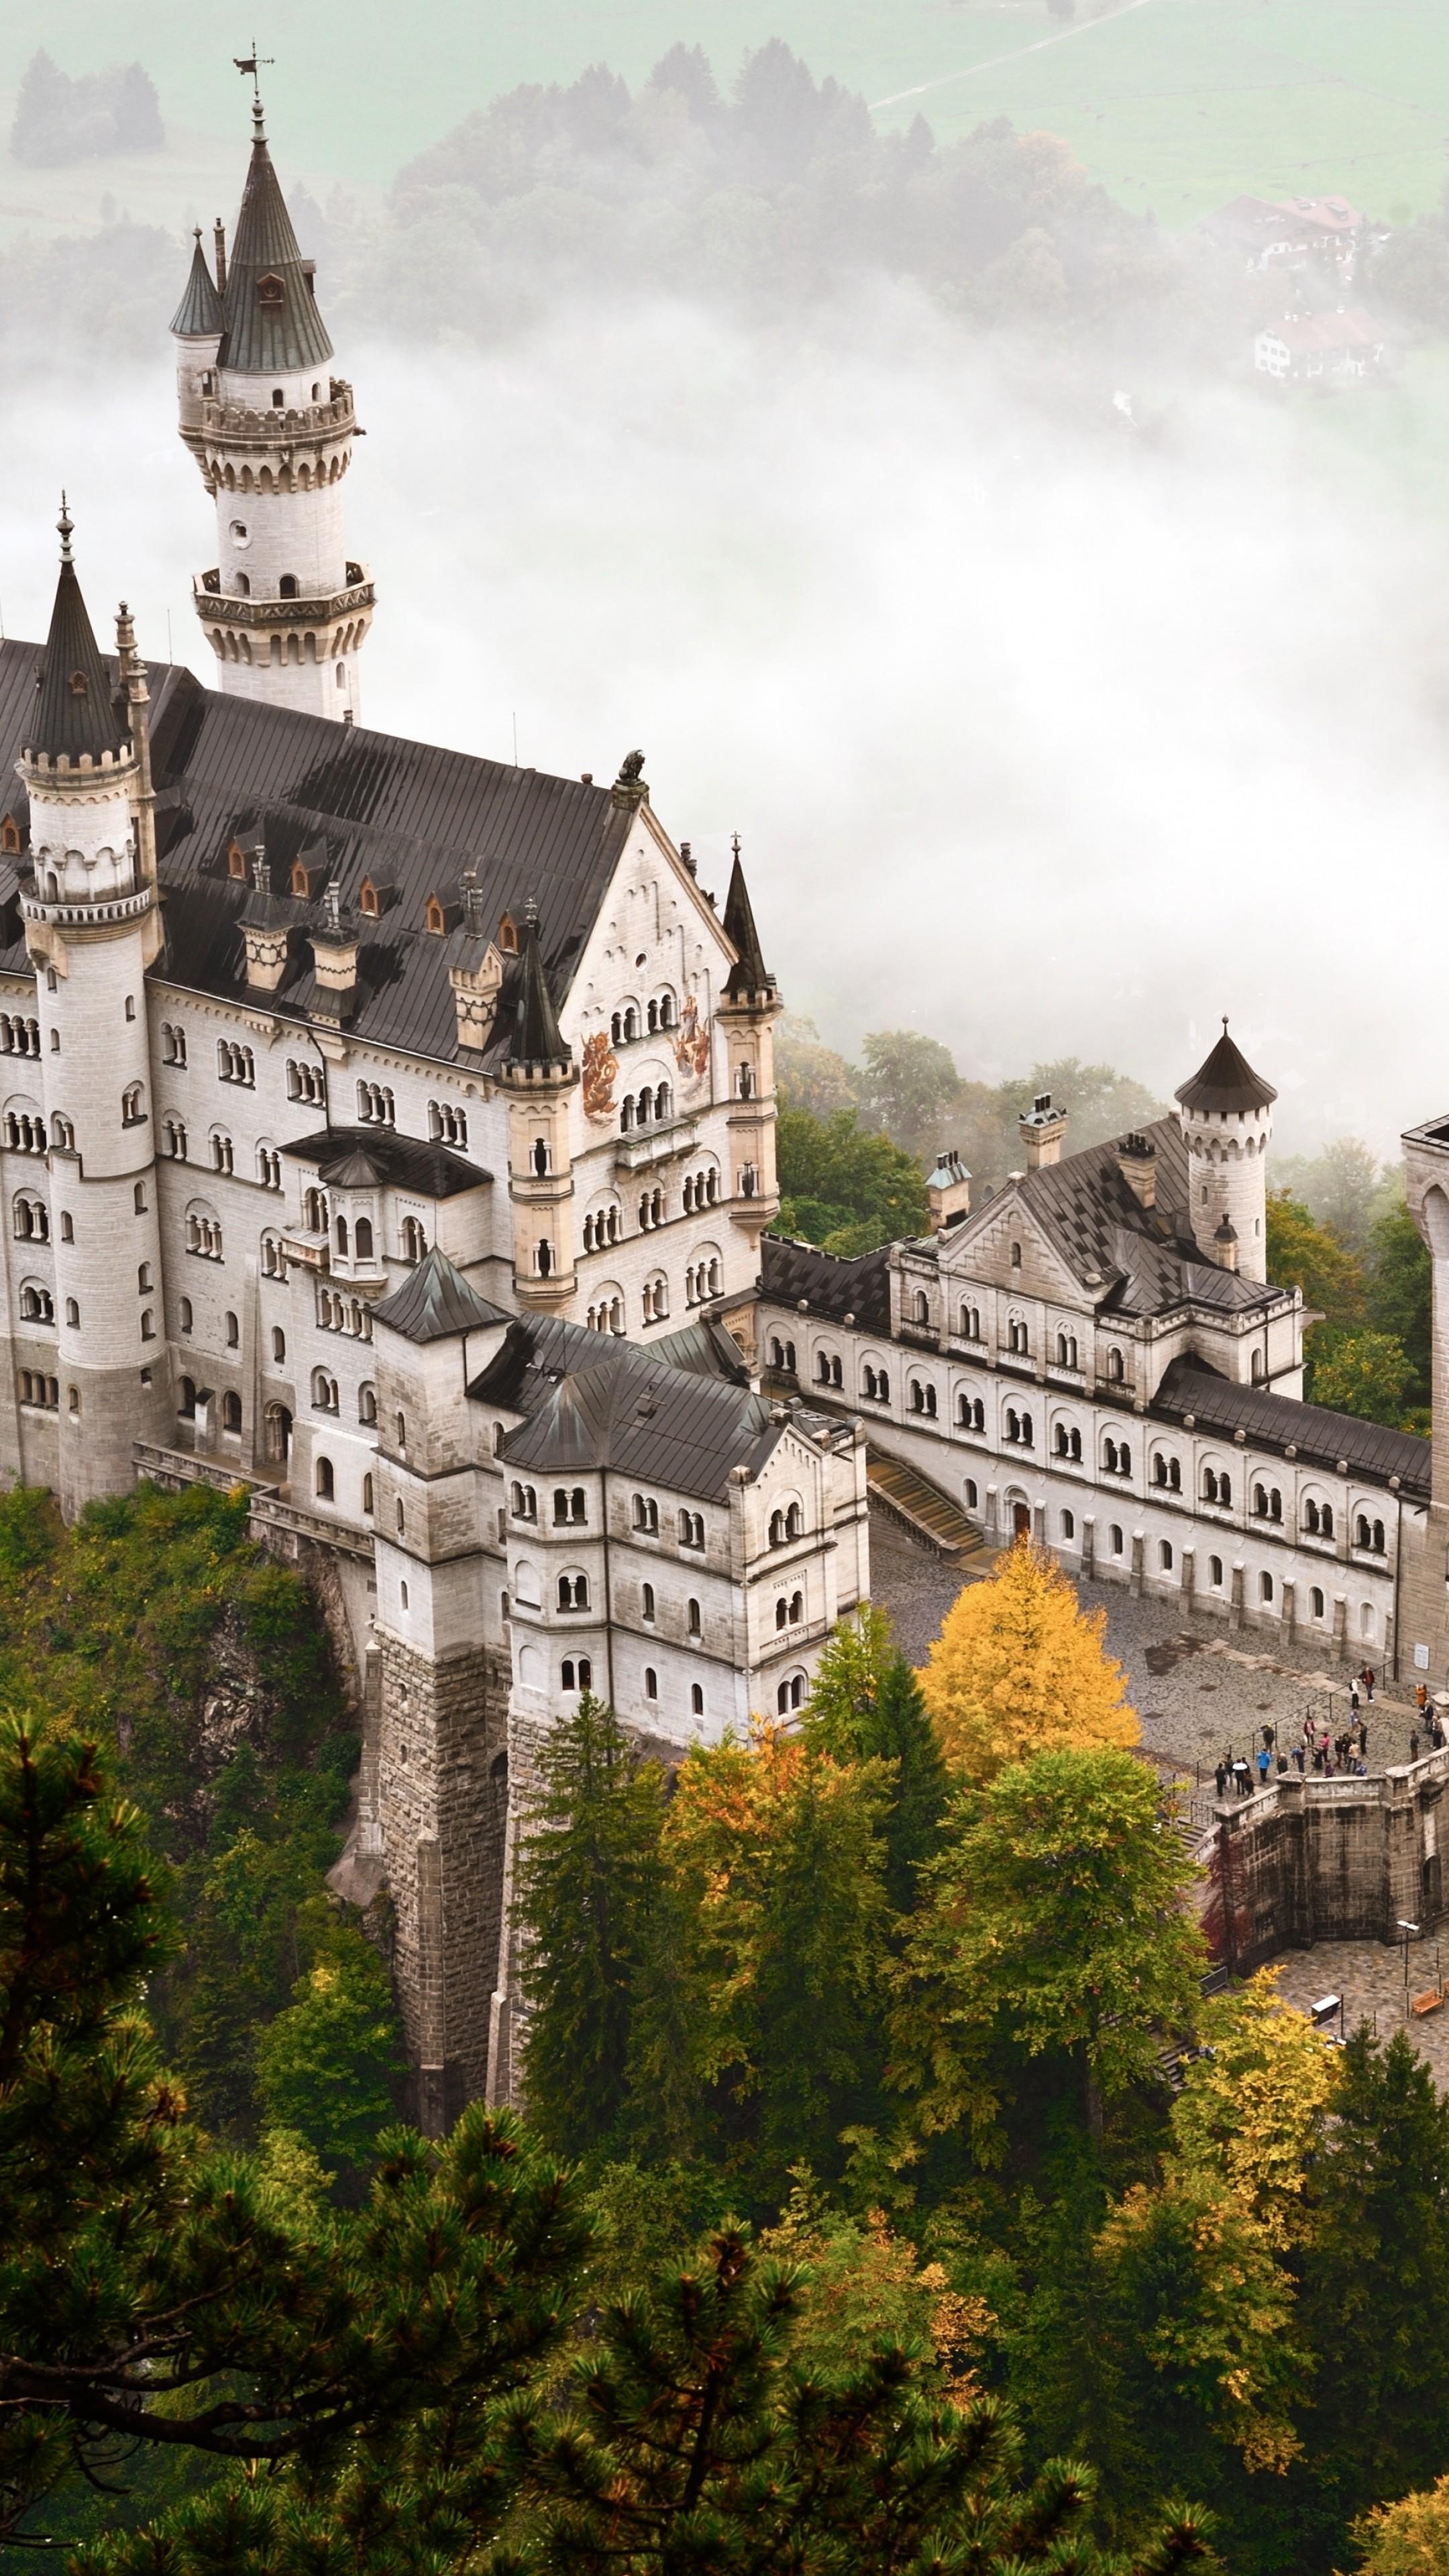 Wallpapers Cars Disney Hd Wallpaper Neuschwanstein Castle Bavaria Germany Tourism